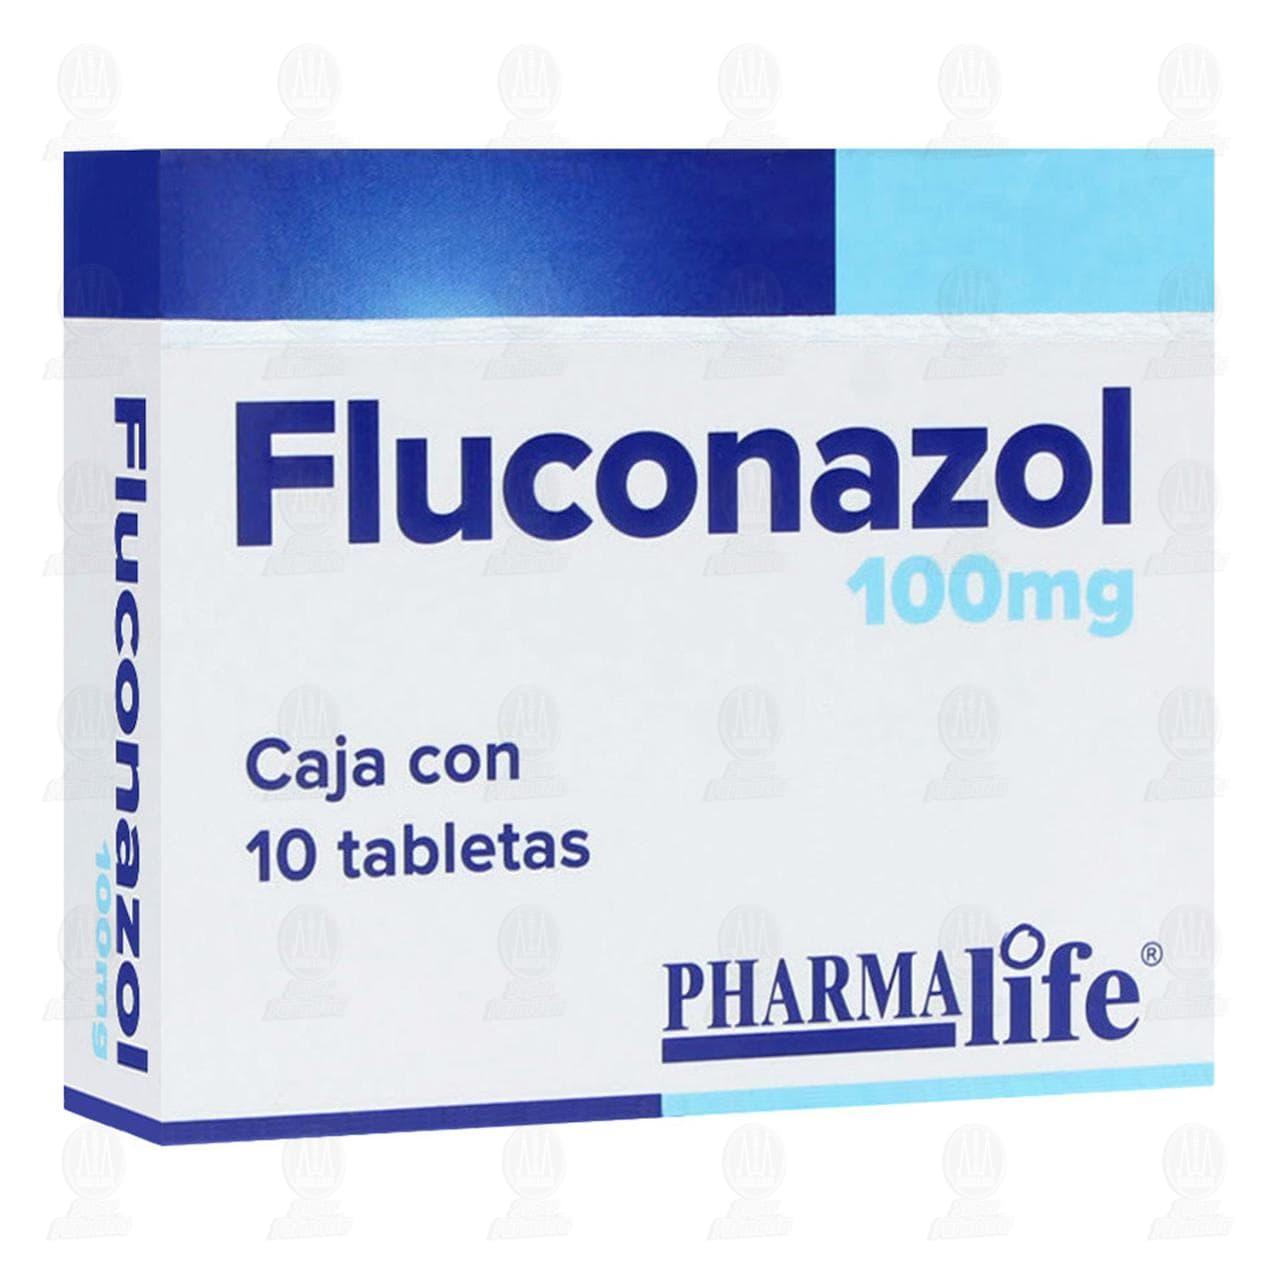 Comprar Fluconazol 100mg 10 Tabletas Pharmalife en Farmacias Guadalajara